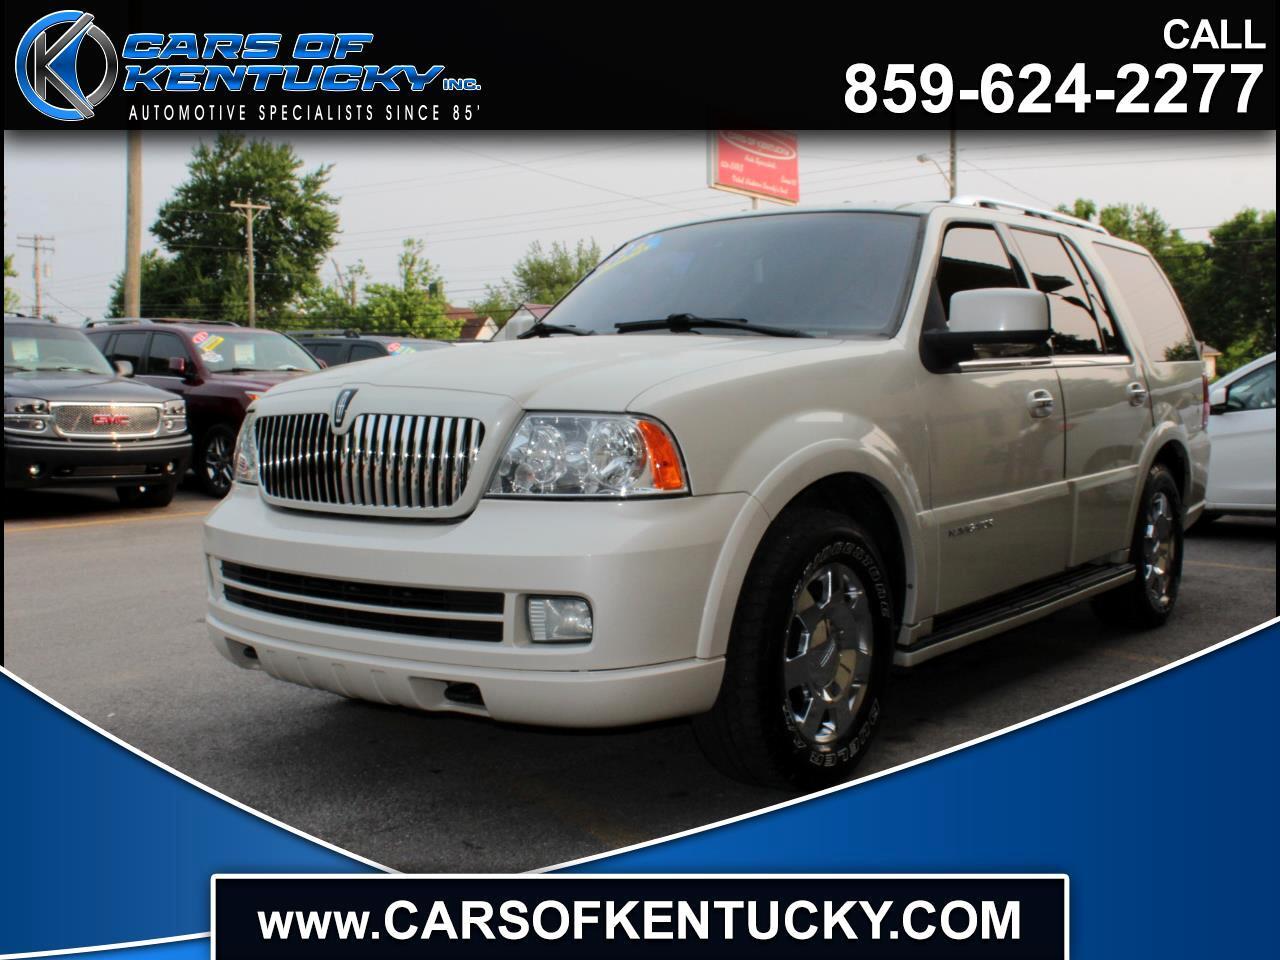 2006 Lincoln Navigator 4WD Luxury